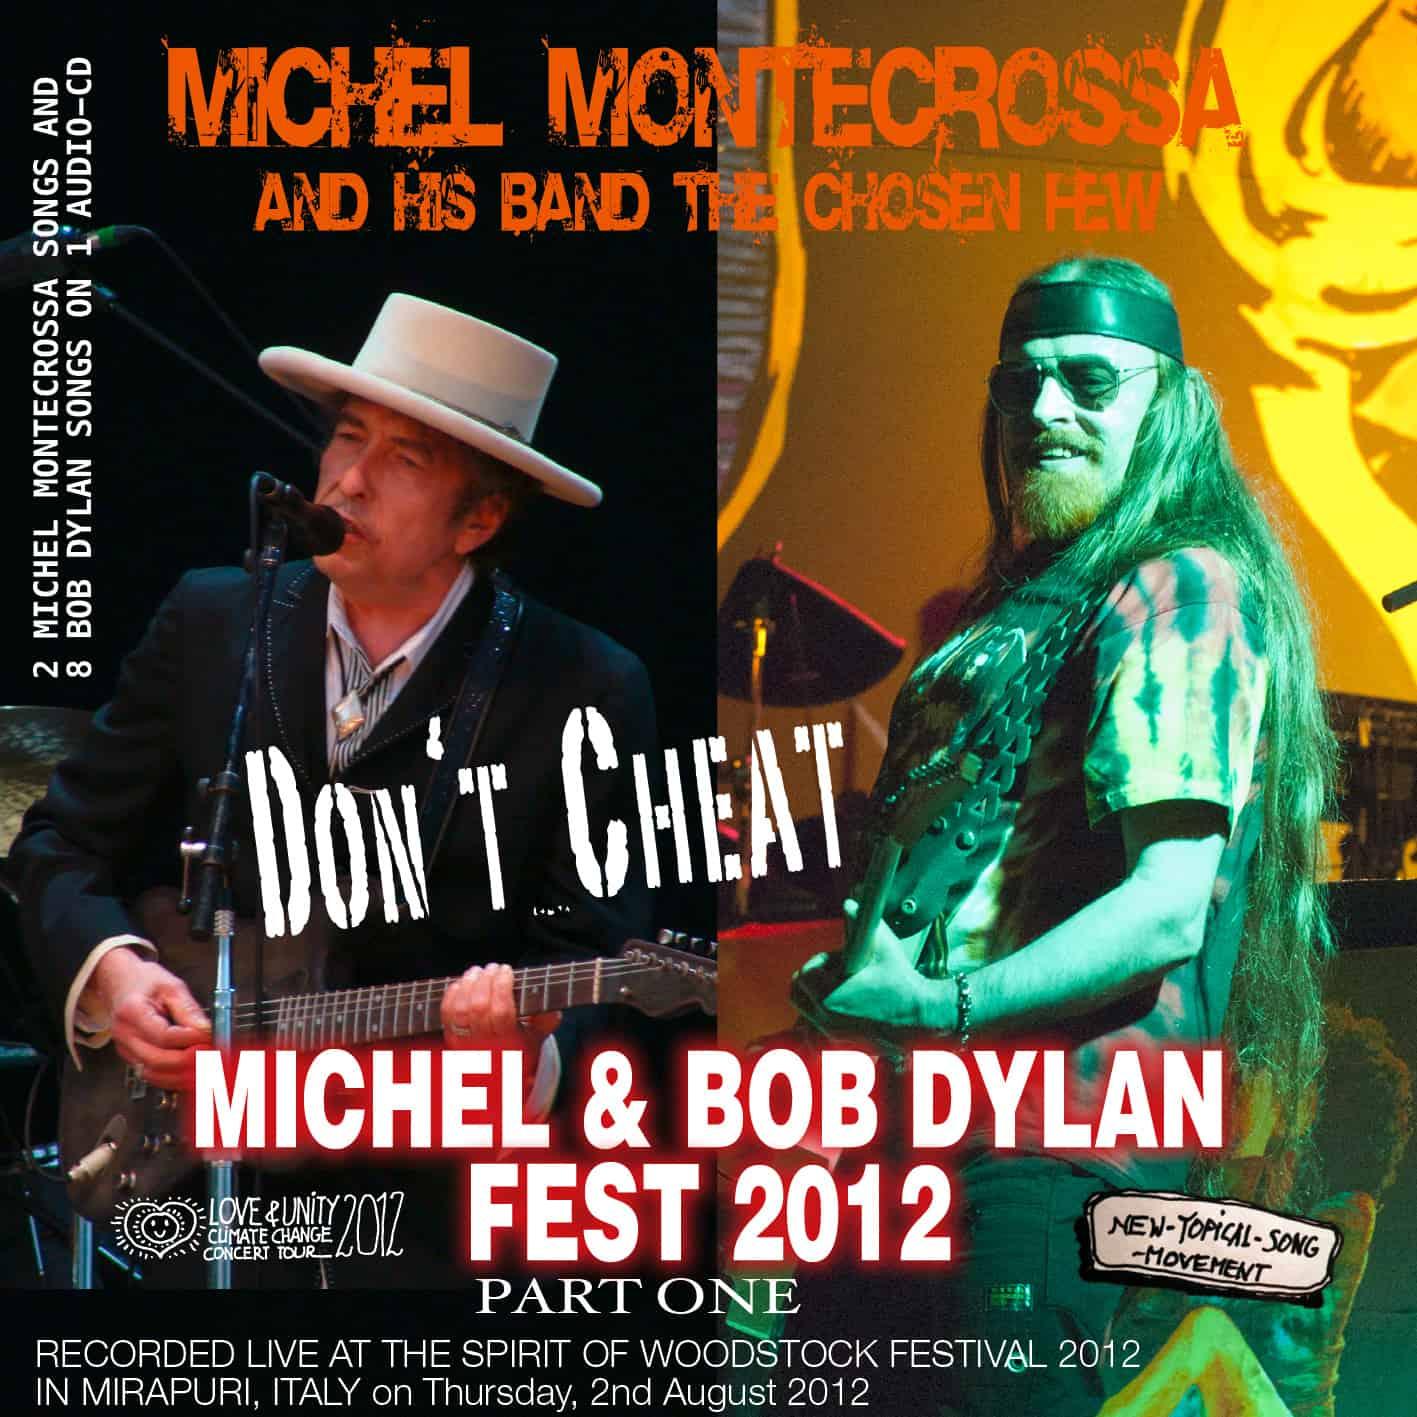 Don't Cheat - Part one of Michel Montecrossa's Michel & Bob Dylan Fest 2012